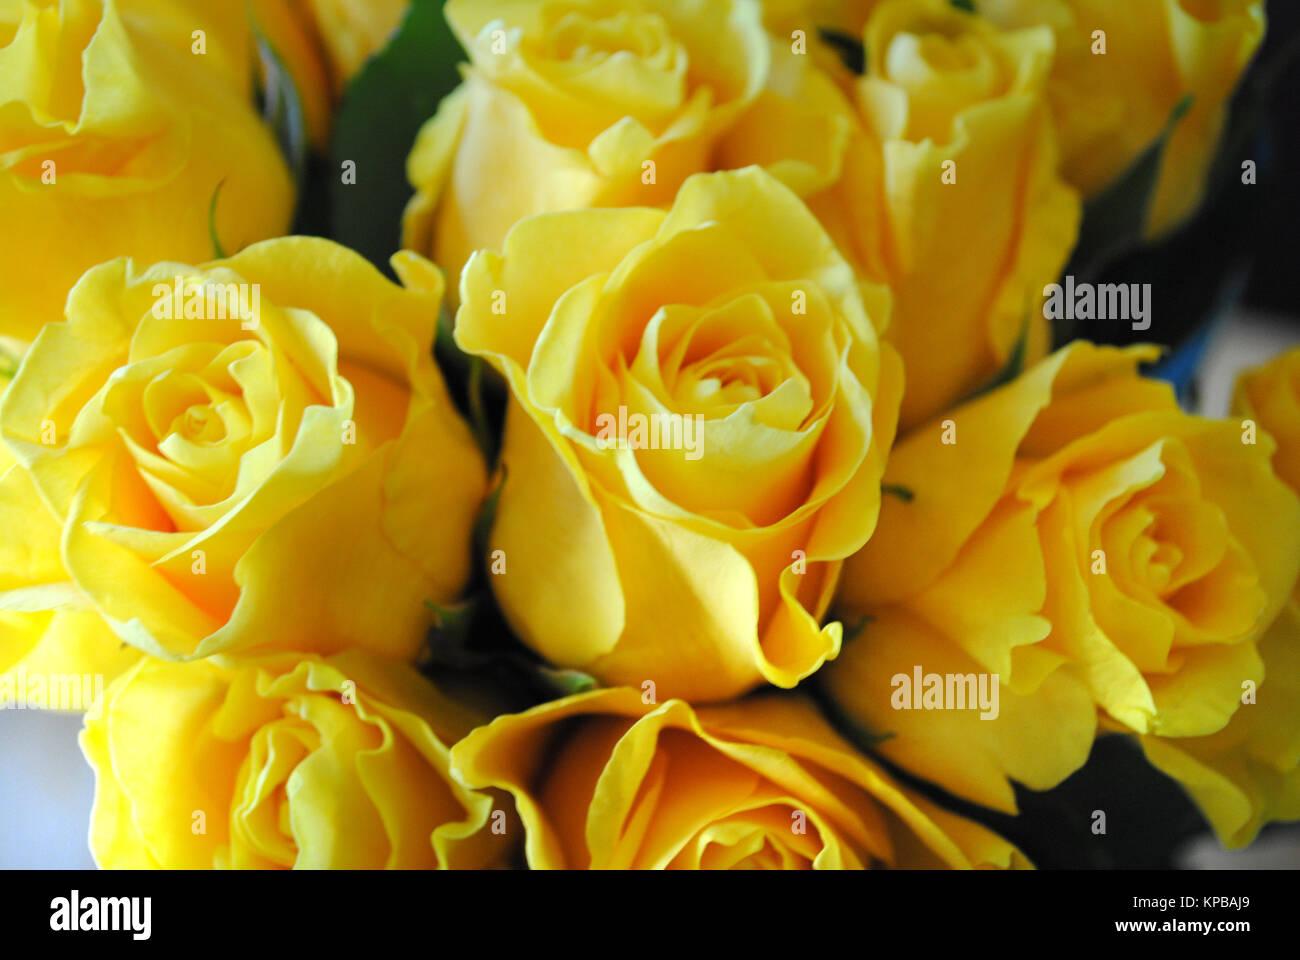 yellow roses - Stock Image